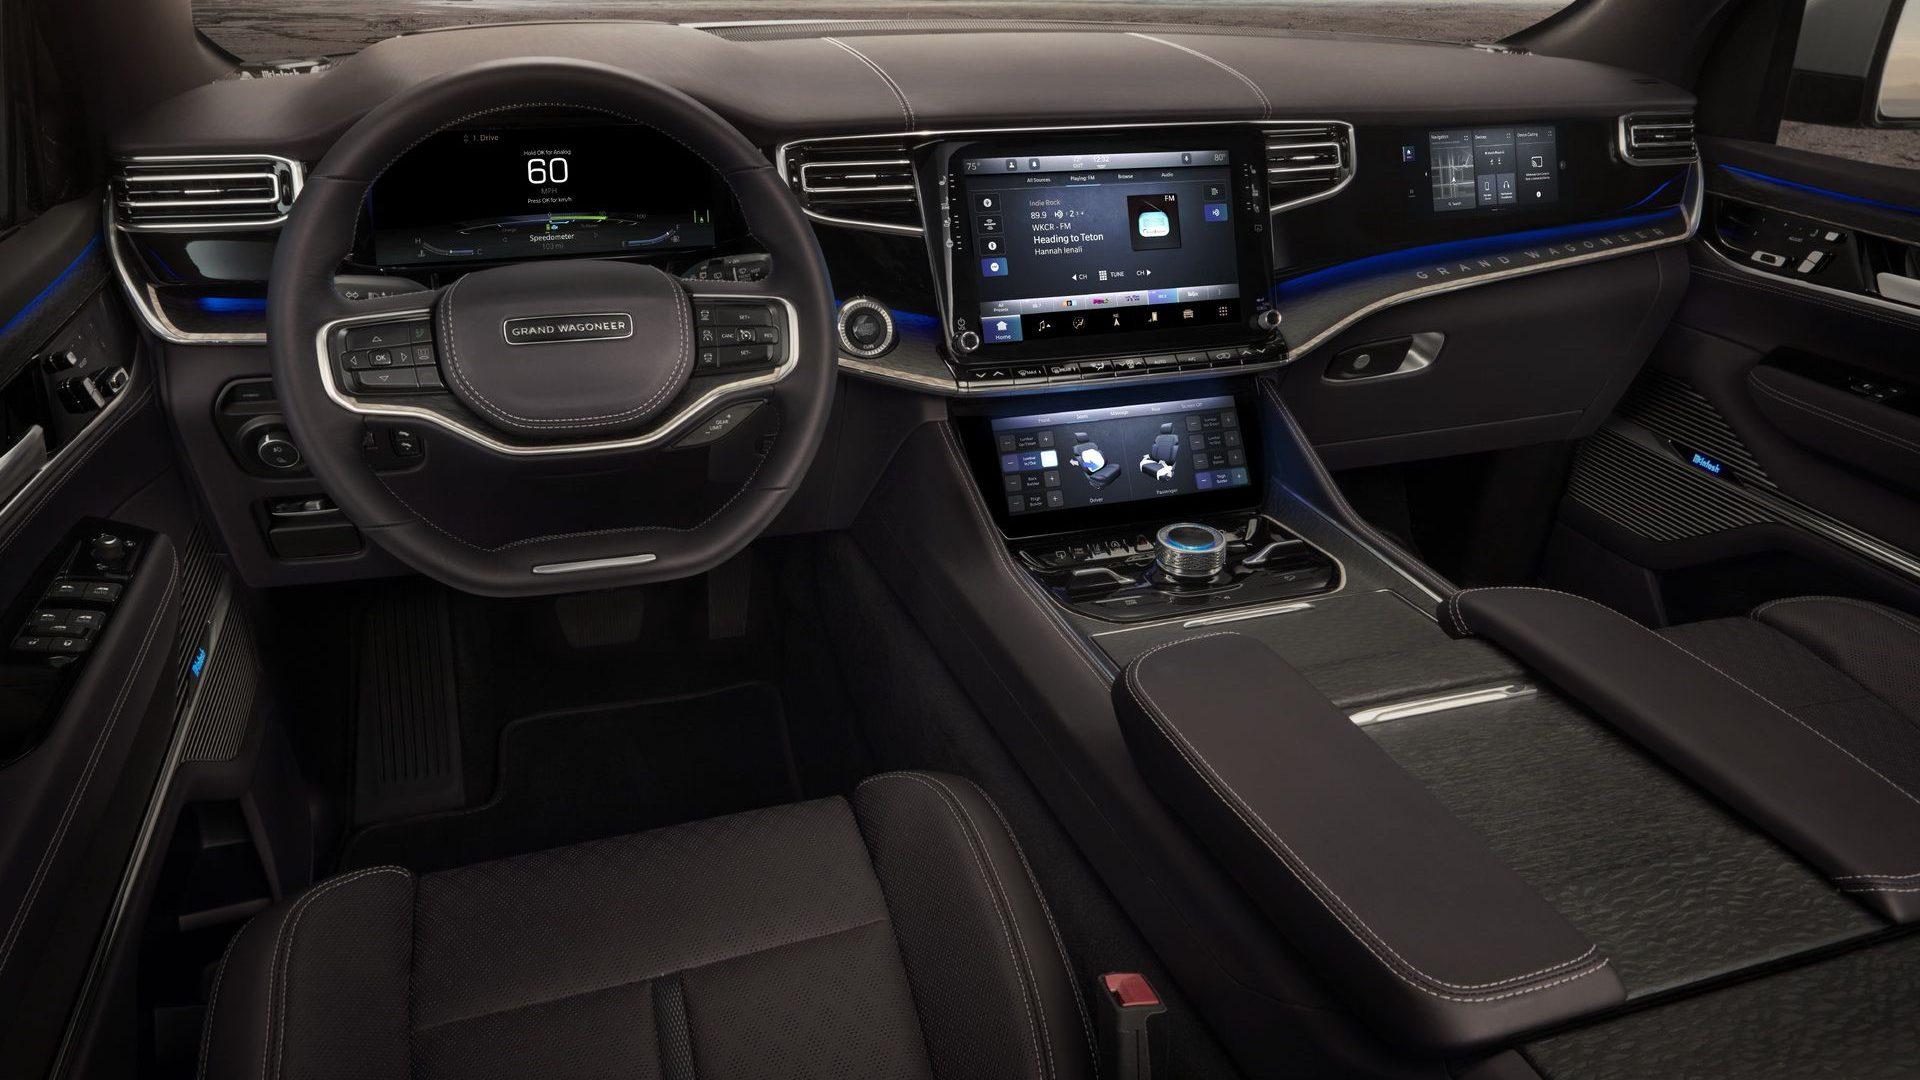 2020-Jeep-Grand-Wagoneer-Concept-Interior-02